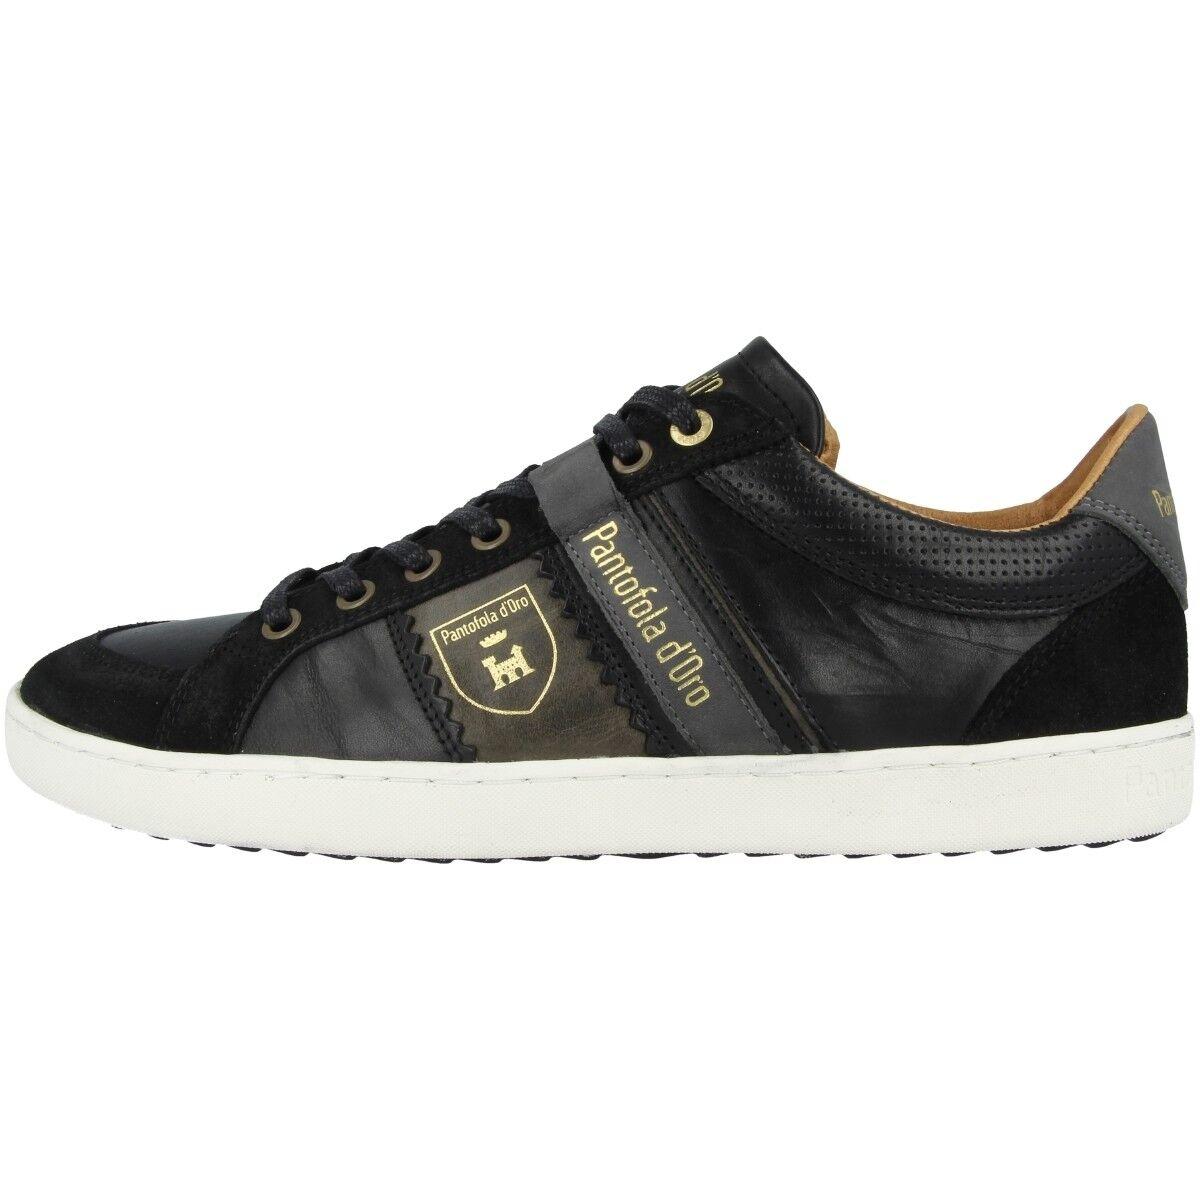 Pantofola d Pesaro Oro Savio hombre Low Pesaro d Piceno Zapatos Sneaker Negro 10183041.25Y 14b371